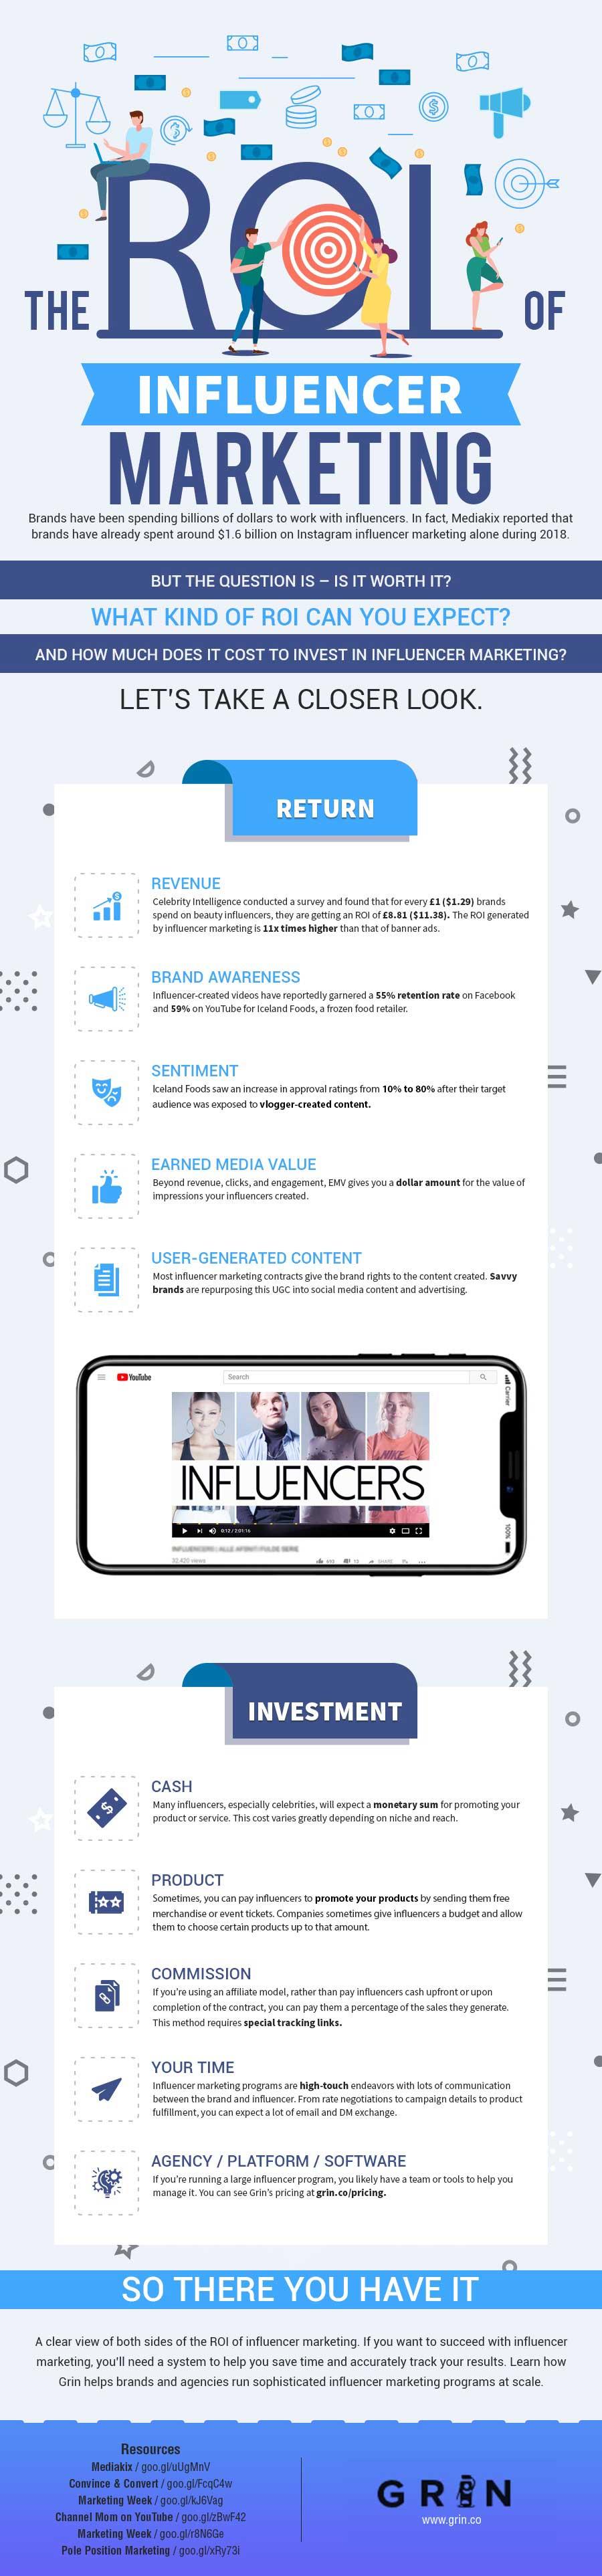 The-ROI-of-Influencer-Marketing